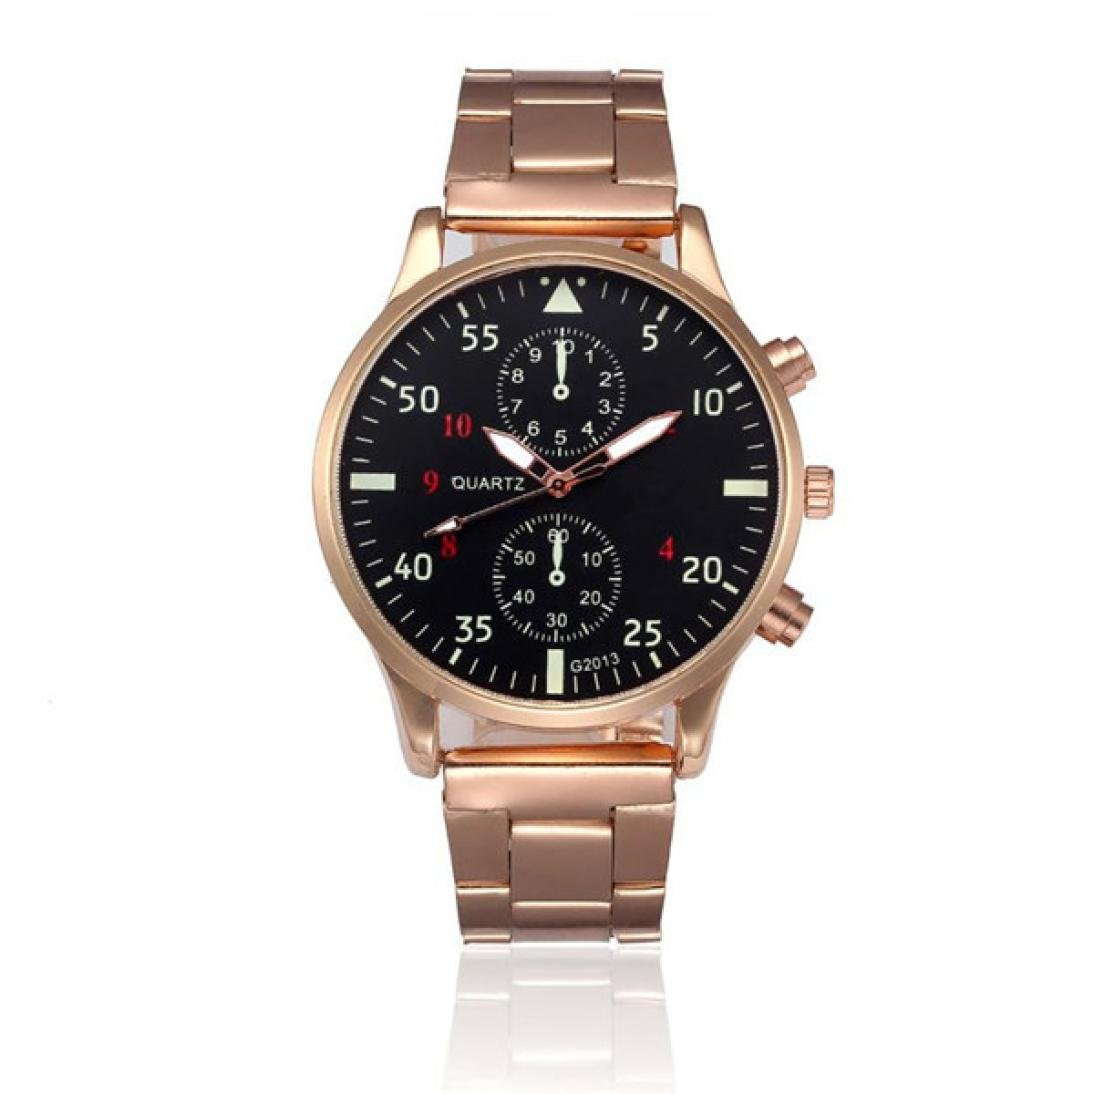 Quaanti Men's Watch Fashion Man Luxury Crystal Stainless Steel Analog Quartz Wrist Watch relogio Masculino Gold/Black/Silver (Gold)